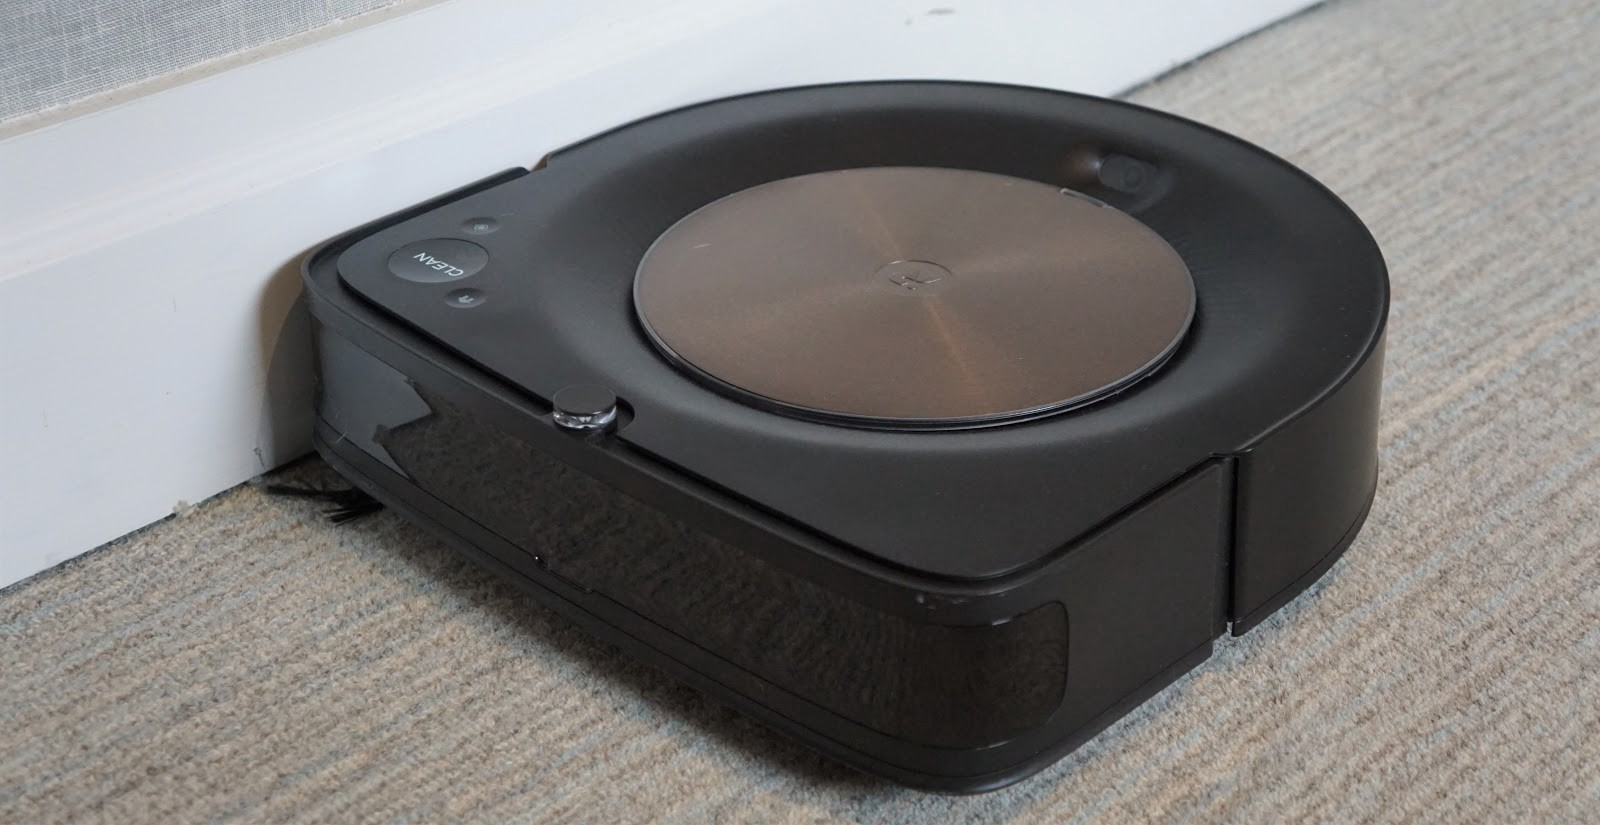 iRobot Roomba S9+ robottolmuimeja